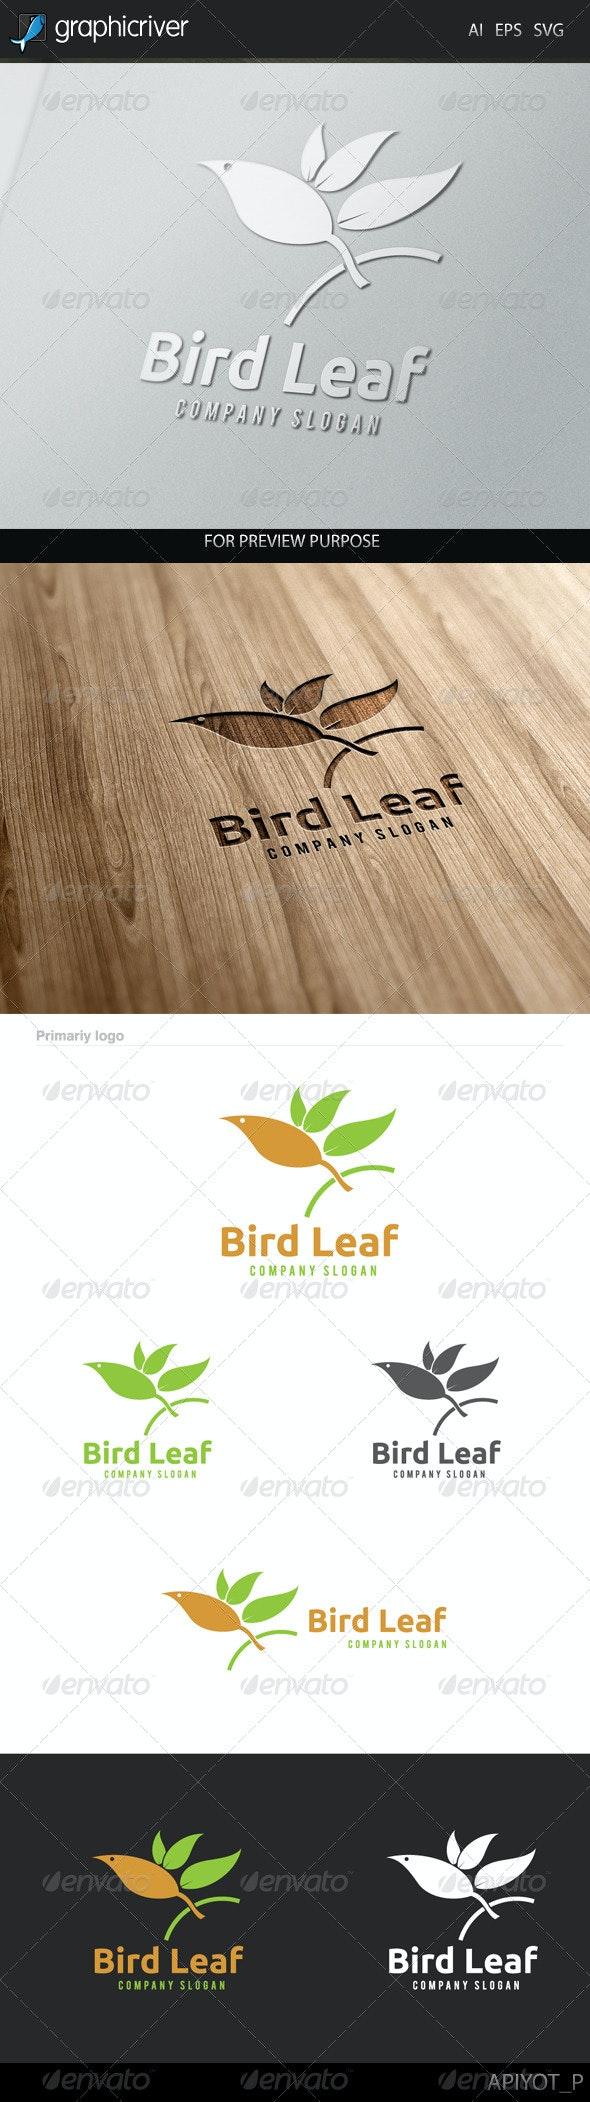 Bird Leaf Logo - Animals Logo Templates